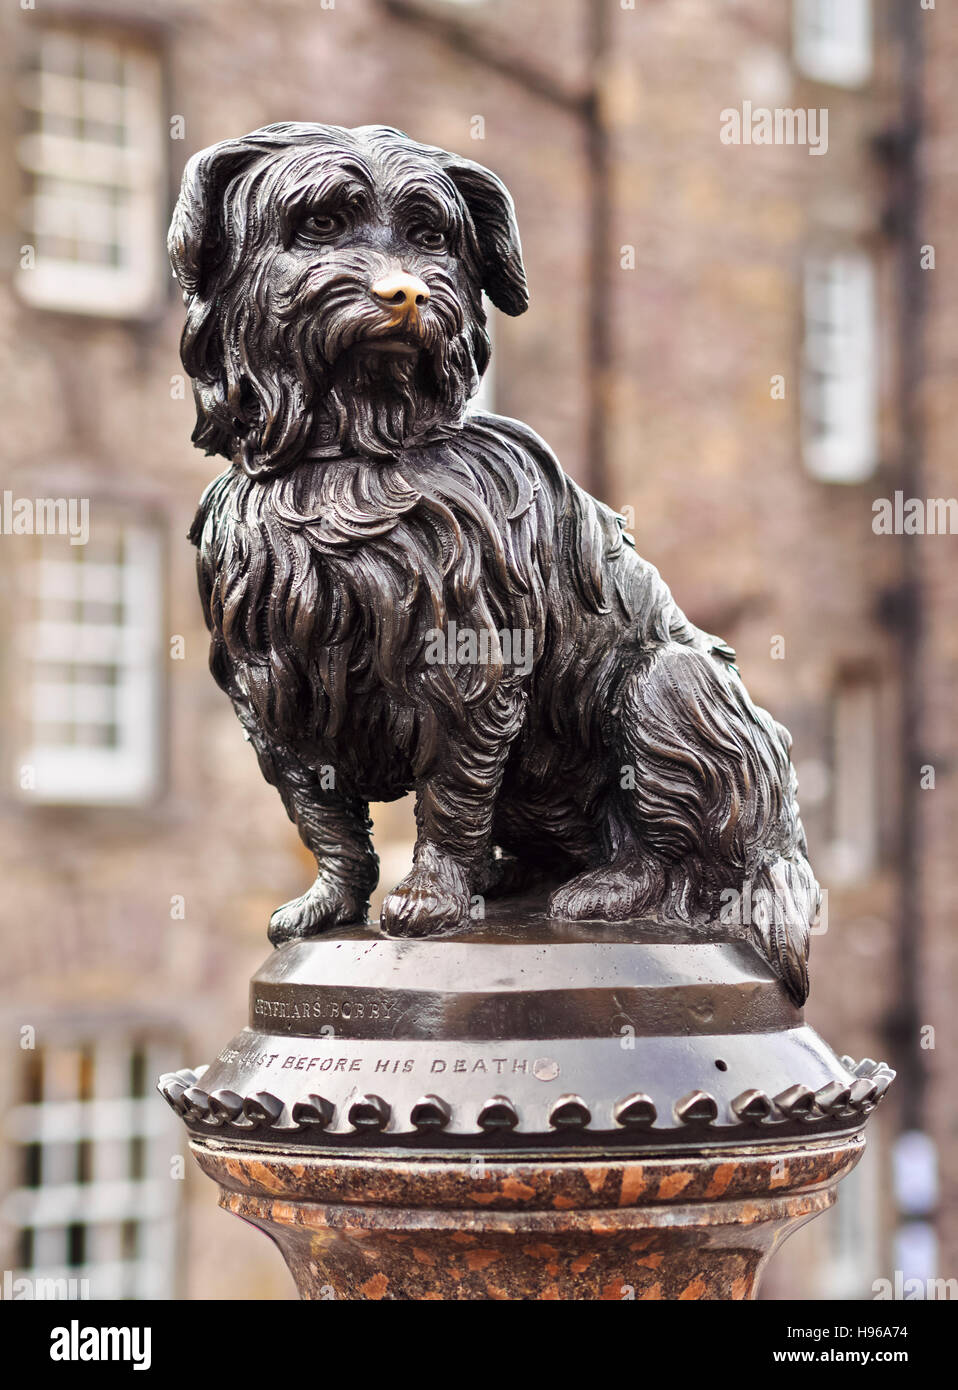 UK, Scotland, Lothian, Edinburgh, Corner of Candlemaker Row and George IV Bridge, Statue of Bobby. Stock Photo